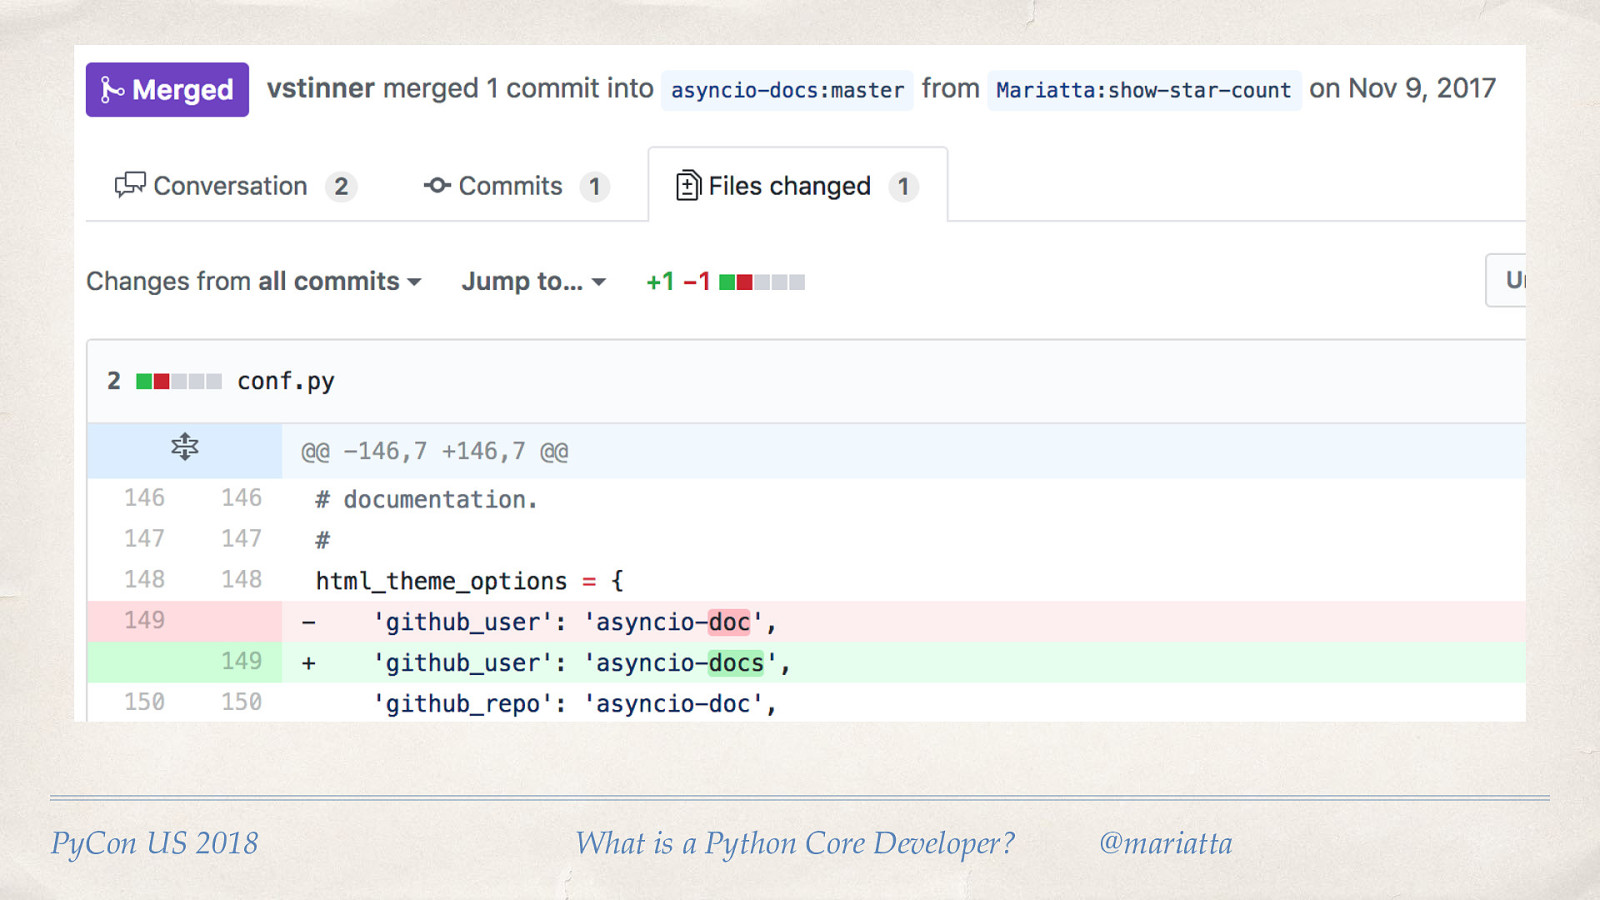 What is a Python Core Developer?